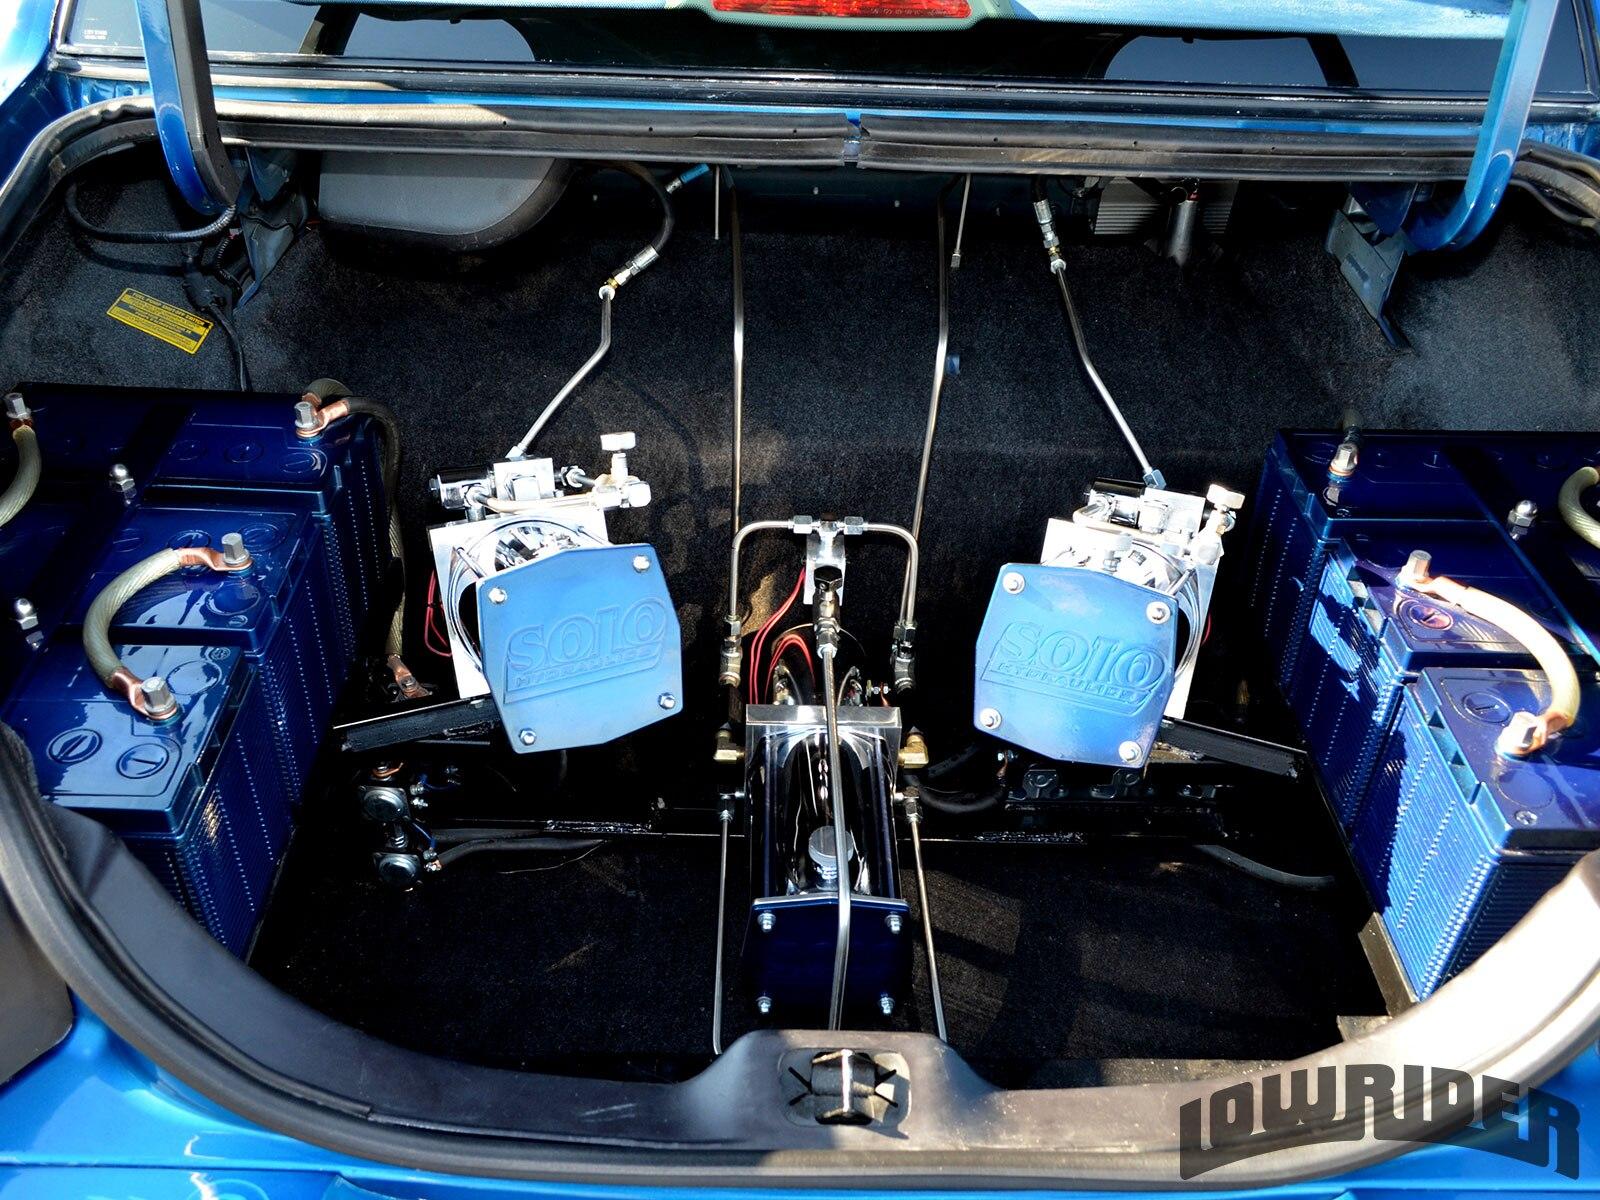 1998 Lincoln Town Car Hydraulic Setup Lowrider